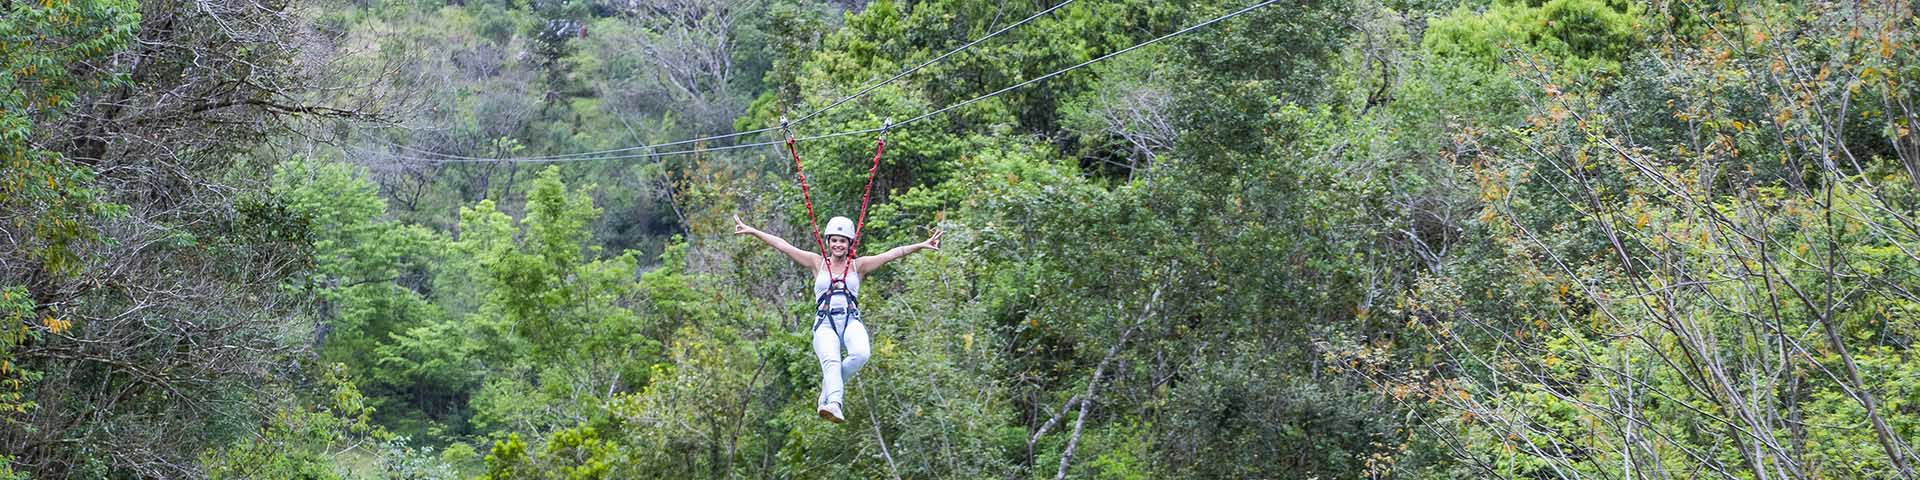 Raft-Adventure-Park-Tirolesa-Bonitour-Passeios-serra-gaucha-sc-2075546_4896.jpg